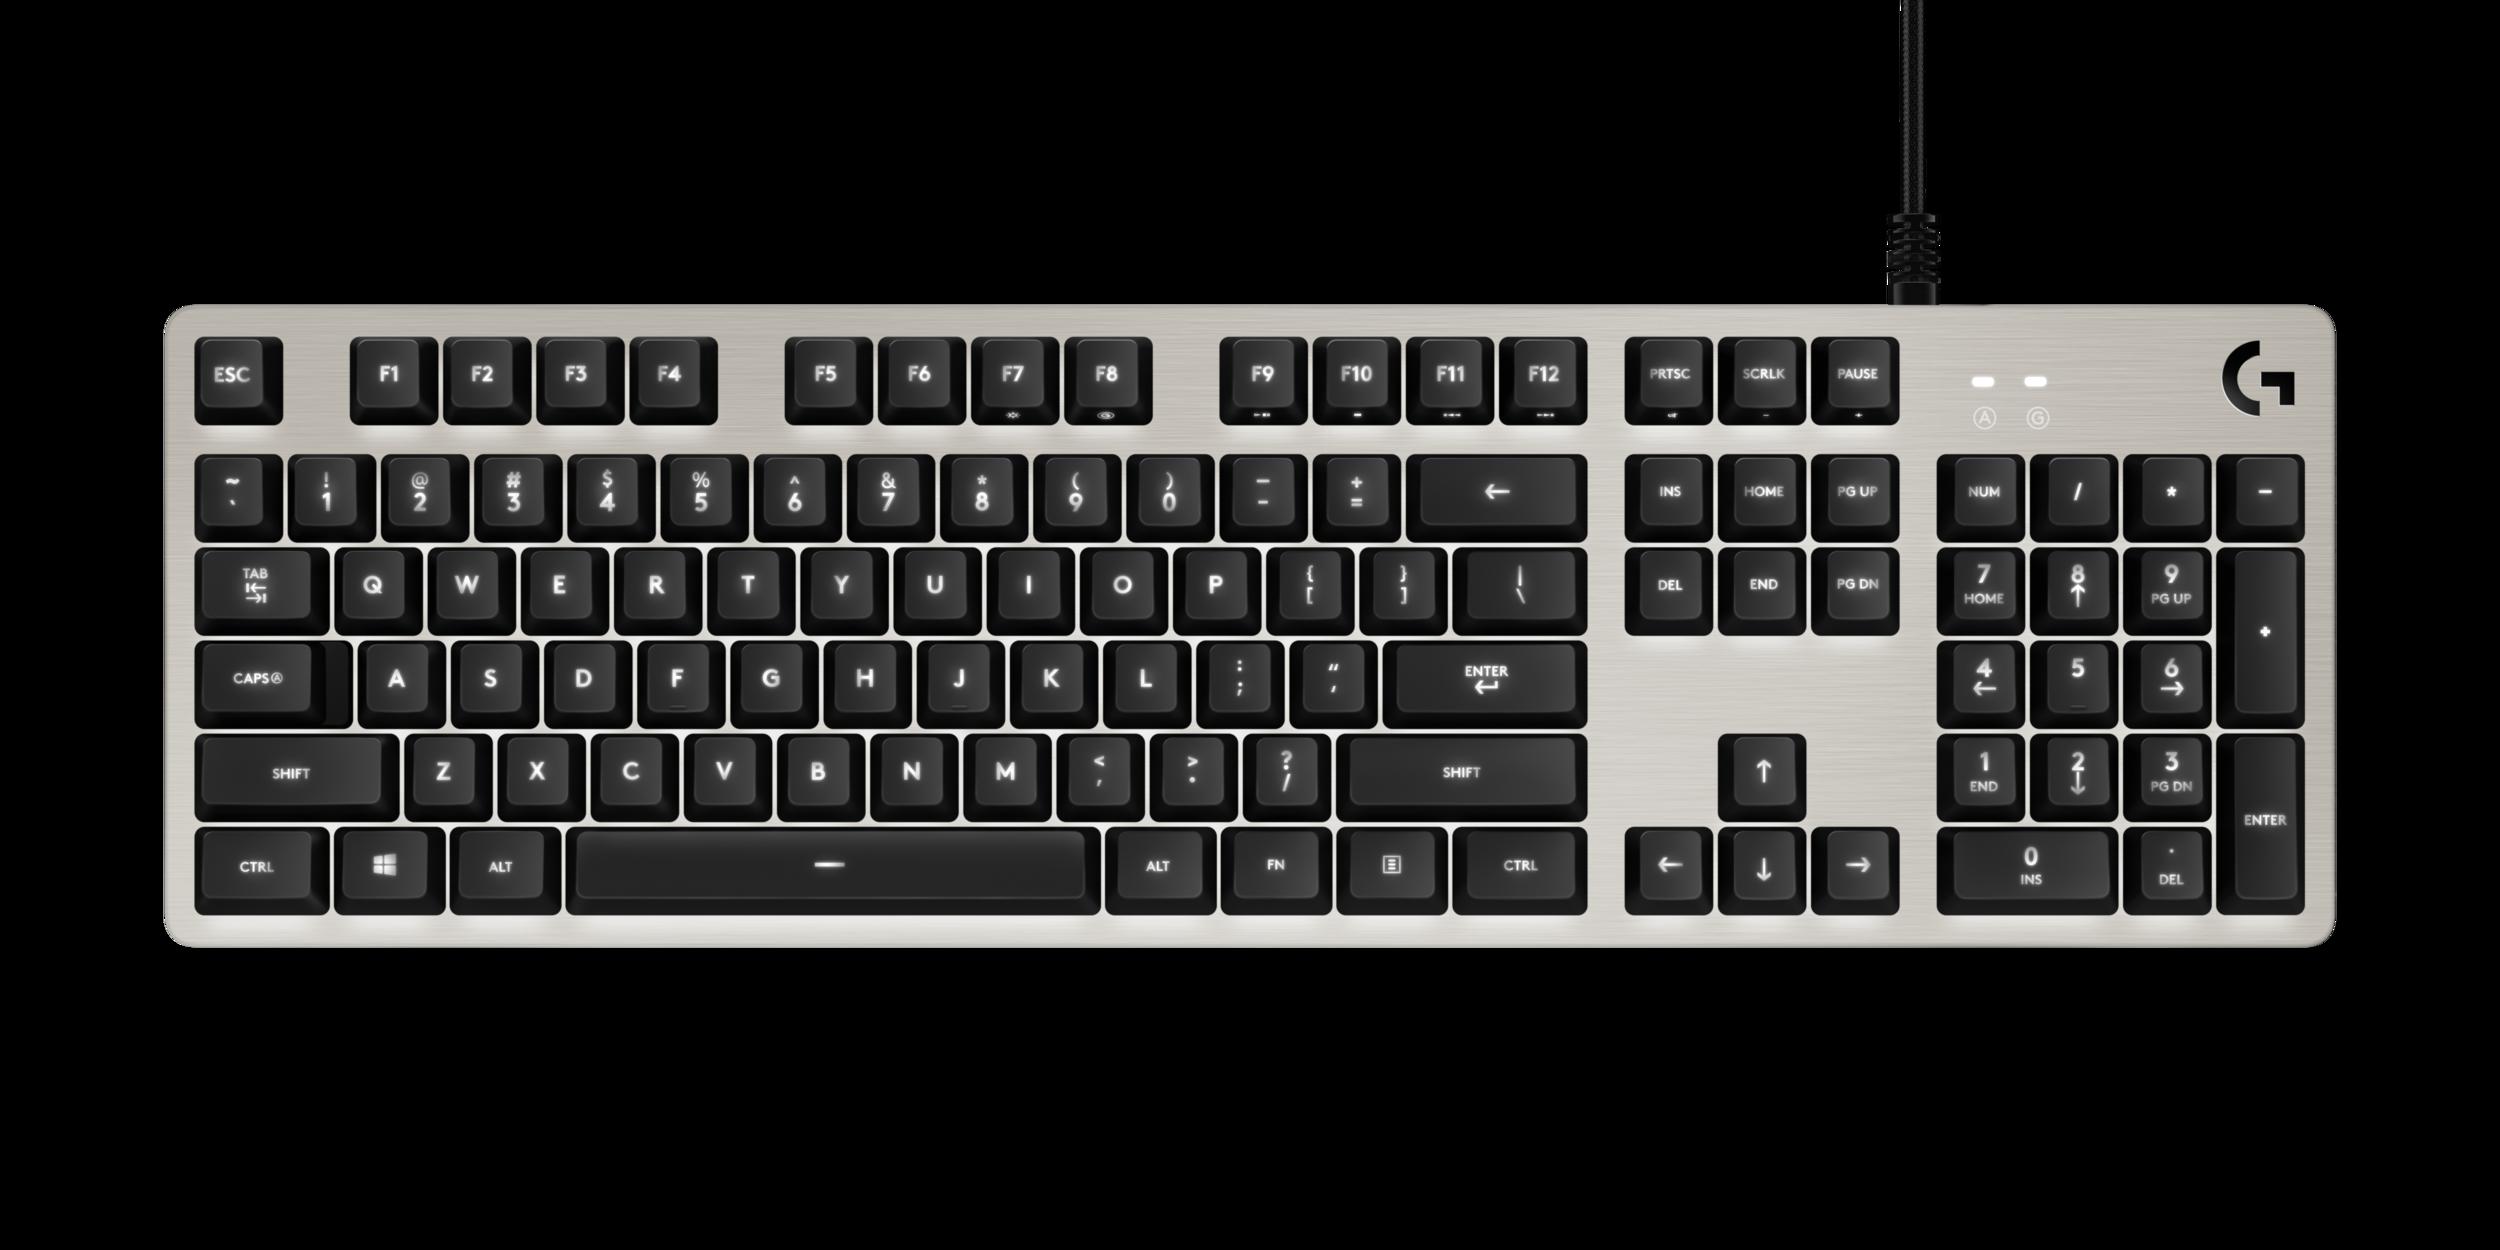 Logitech G413 Mechanical Backlit Gaming Keyboard Review